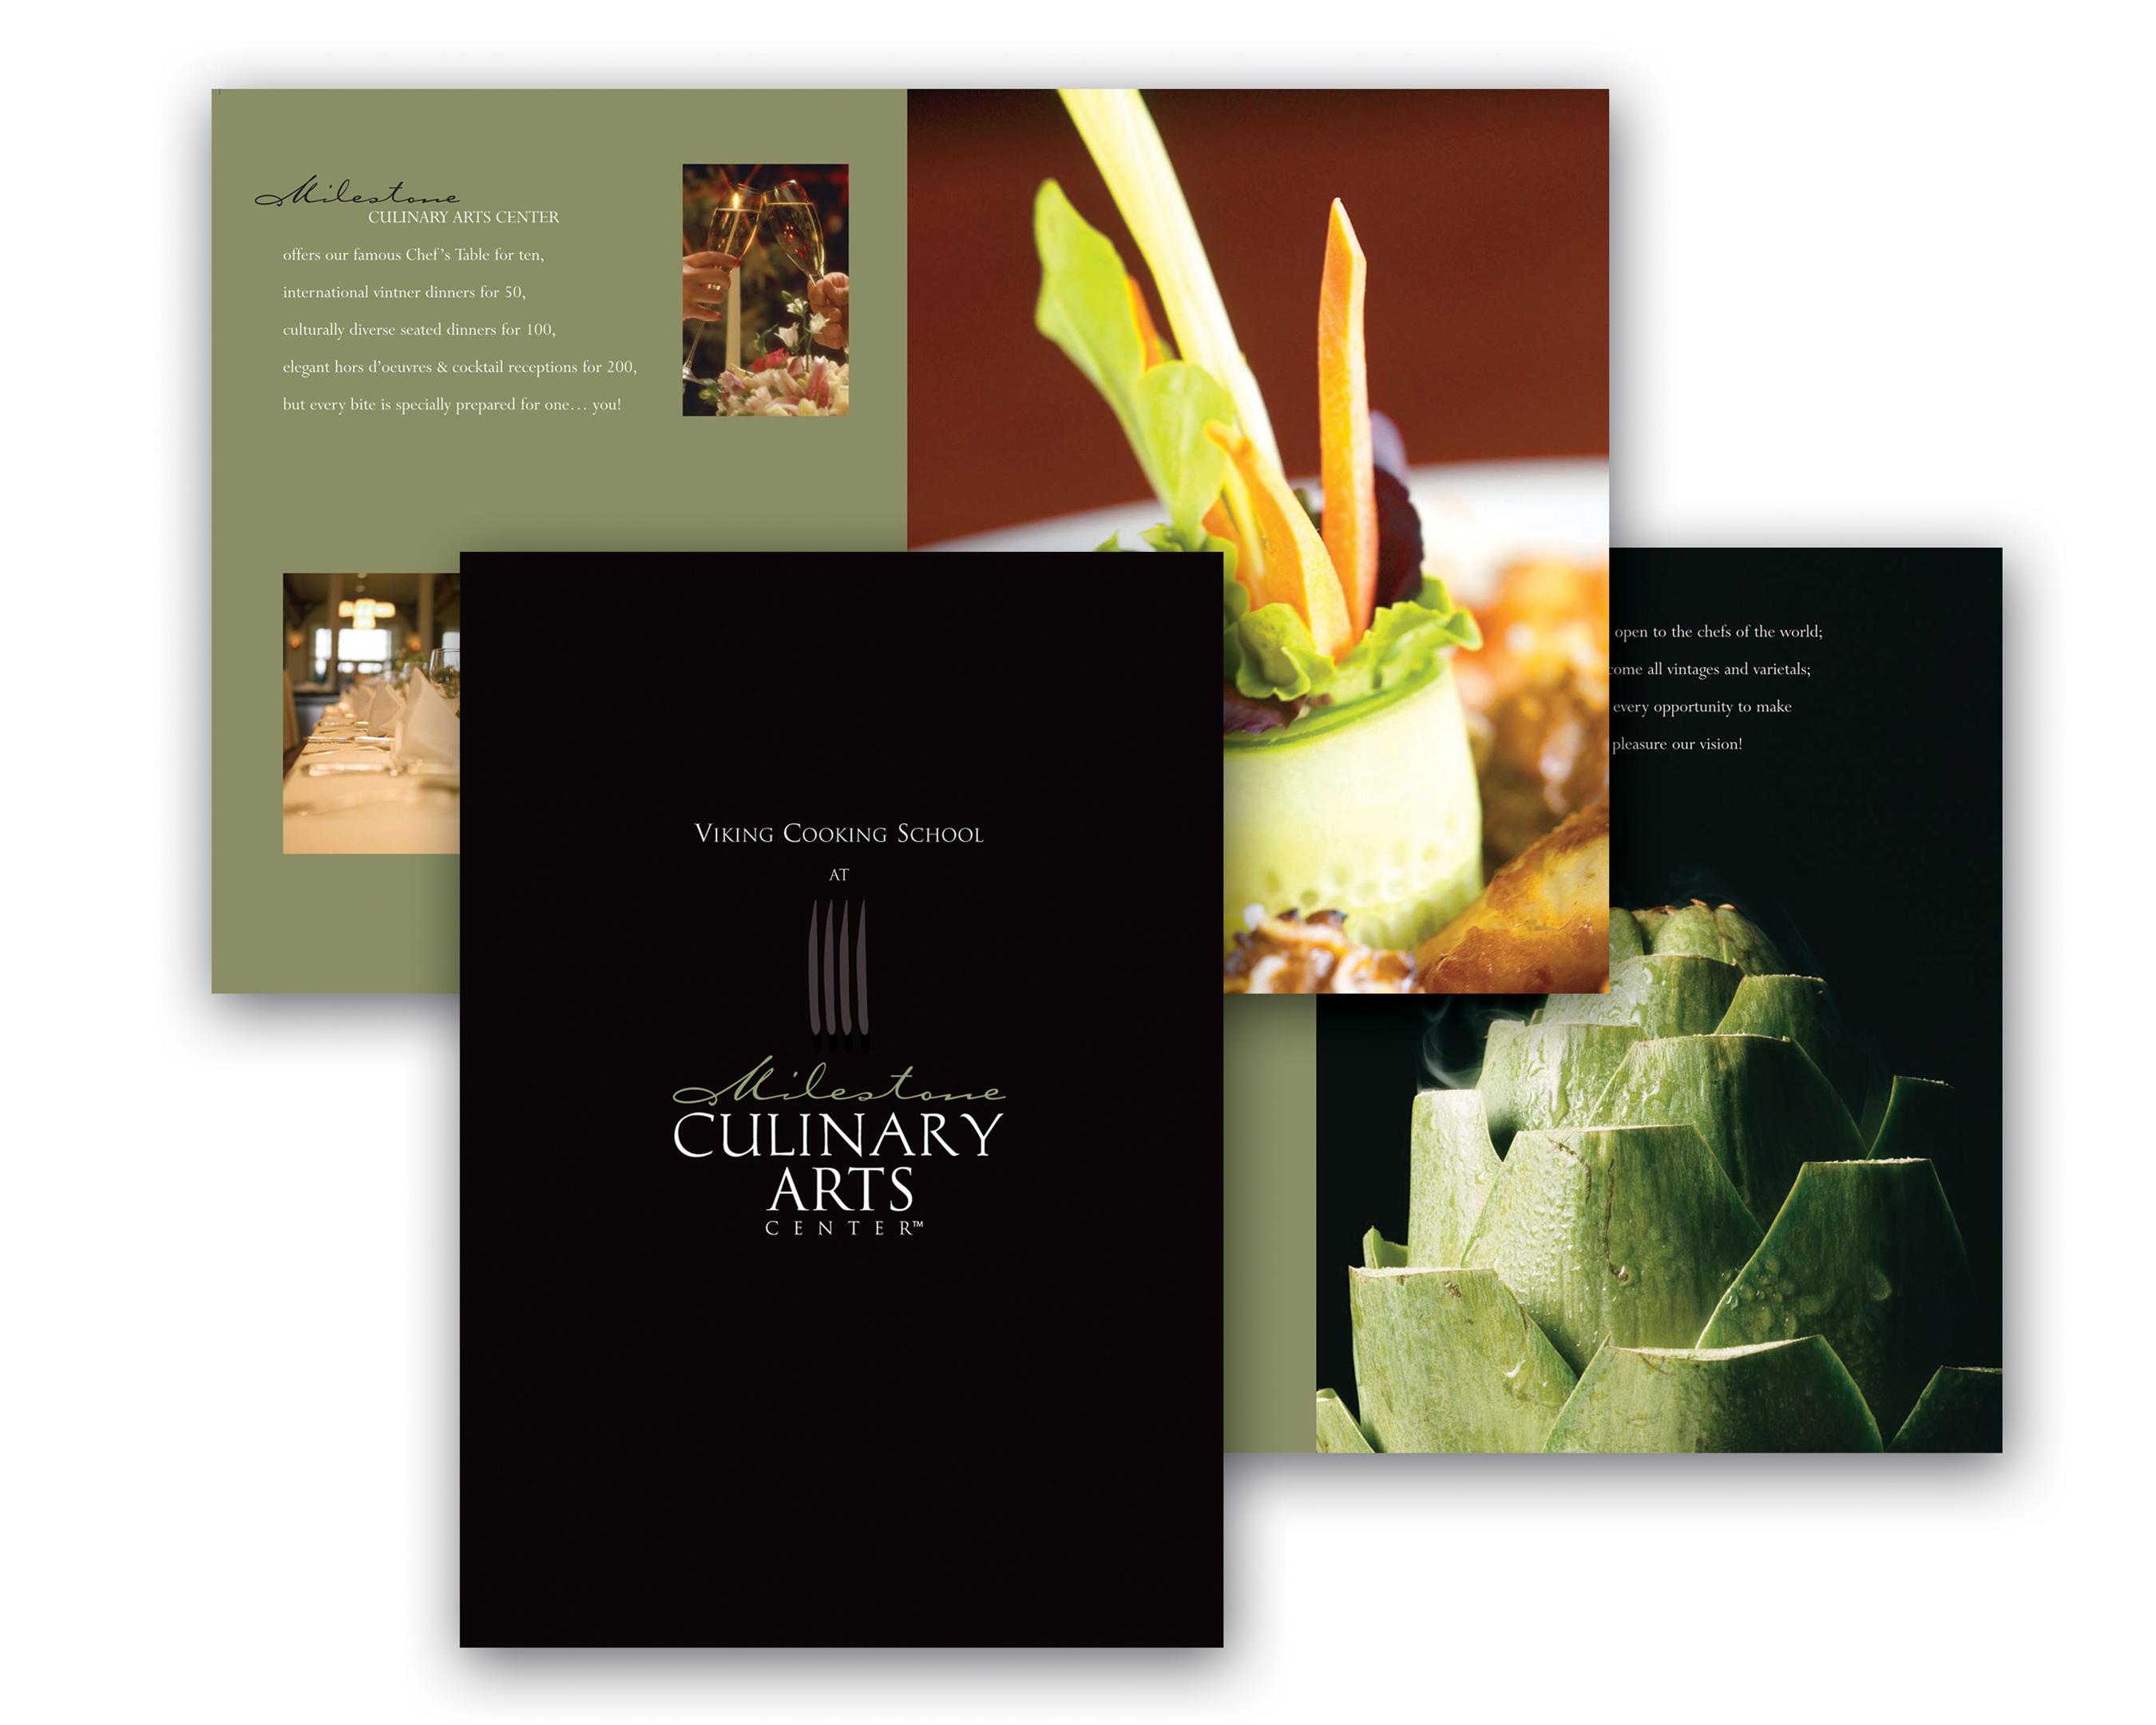 Milestone Culinary